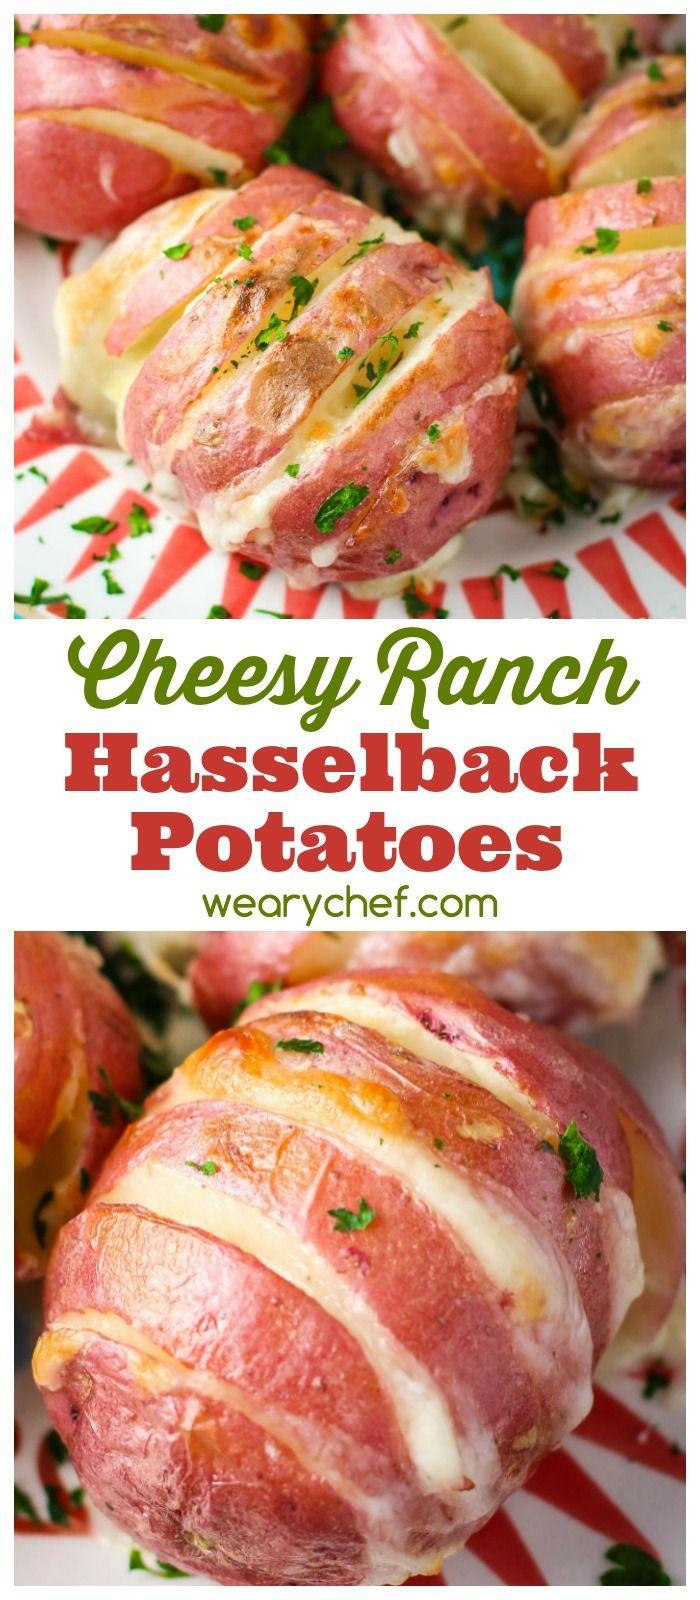 Easy recipes healthy eating ideas hasselback potatoes